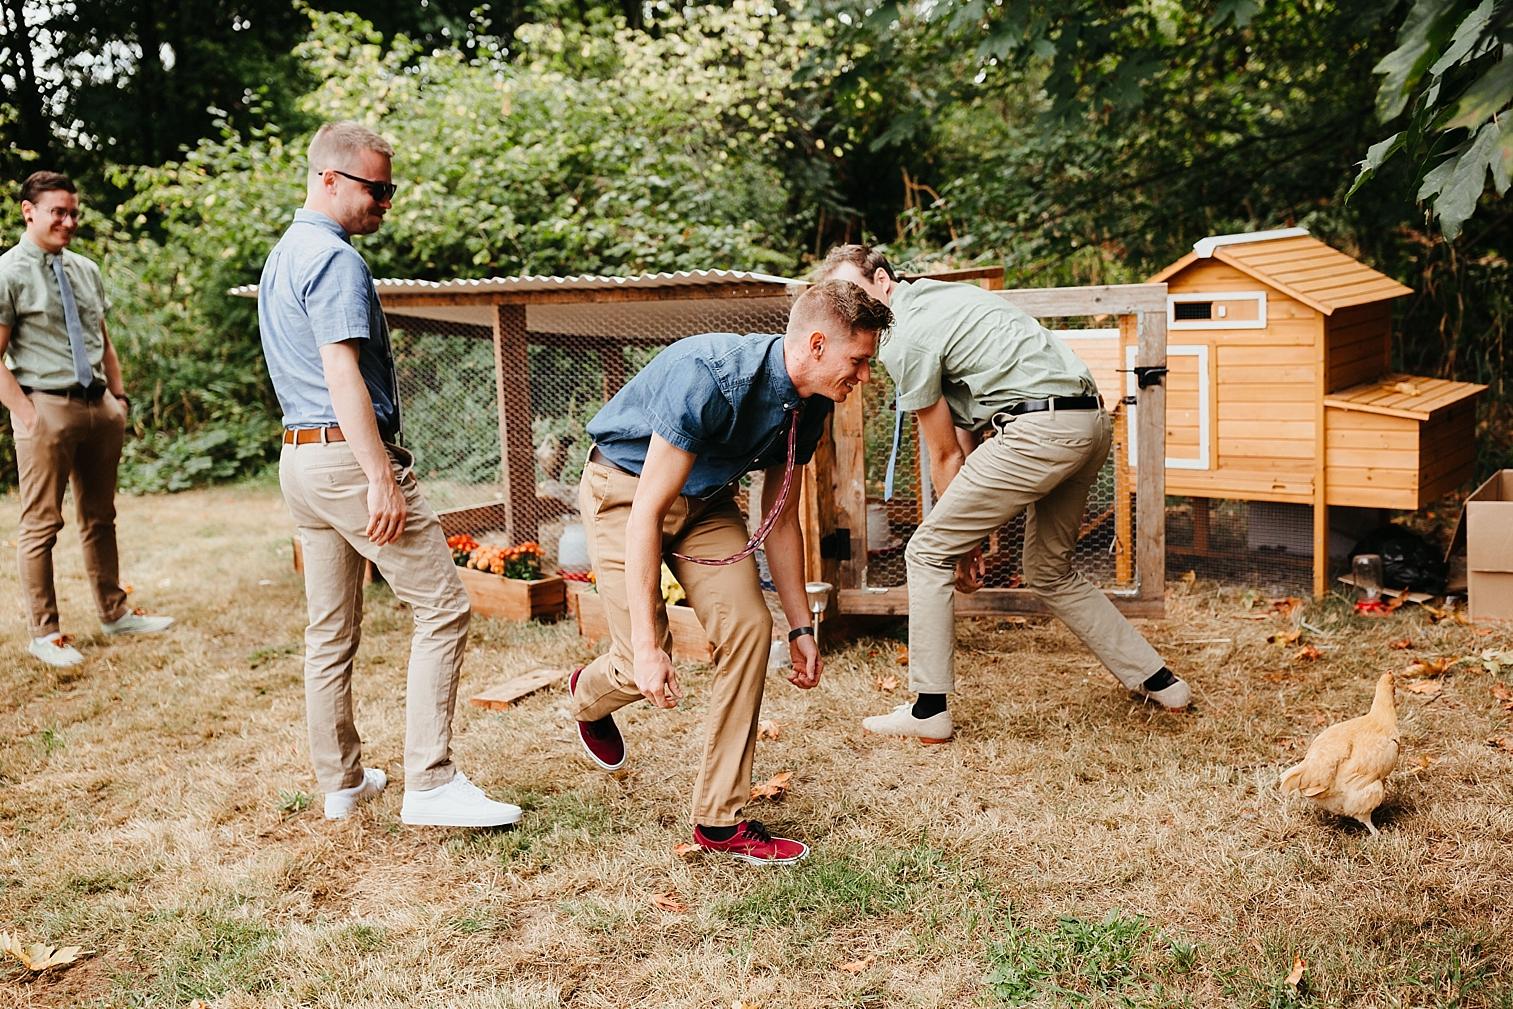 Summer-Camp-Themed-Wedding-22.jpg